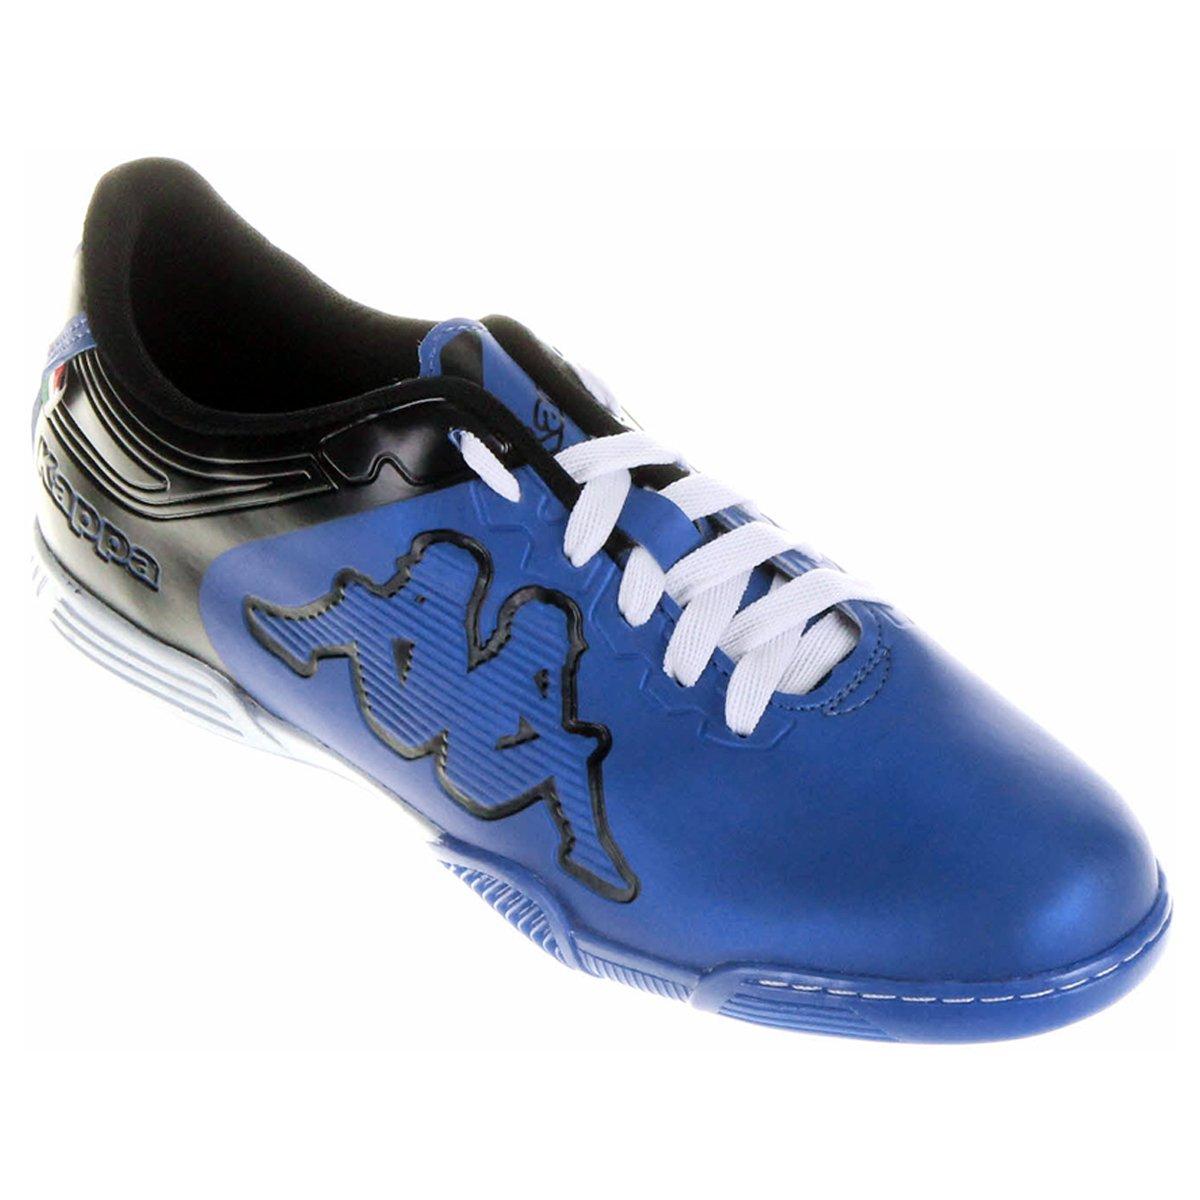 Chuteira Kappa Fuerza Futsal - Compre Agora  6c3ea71cc6675